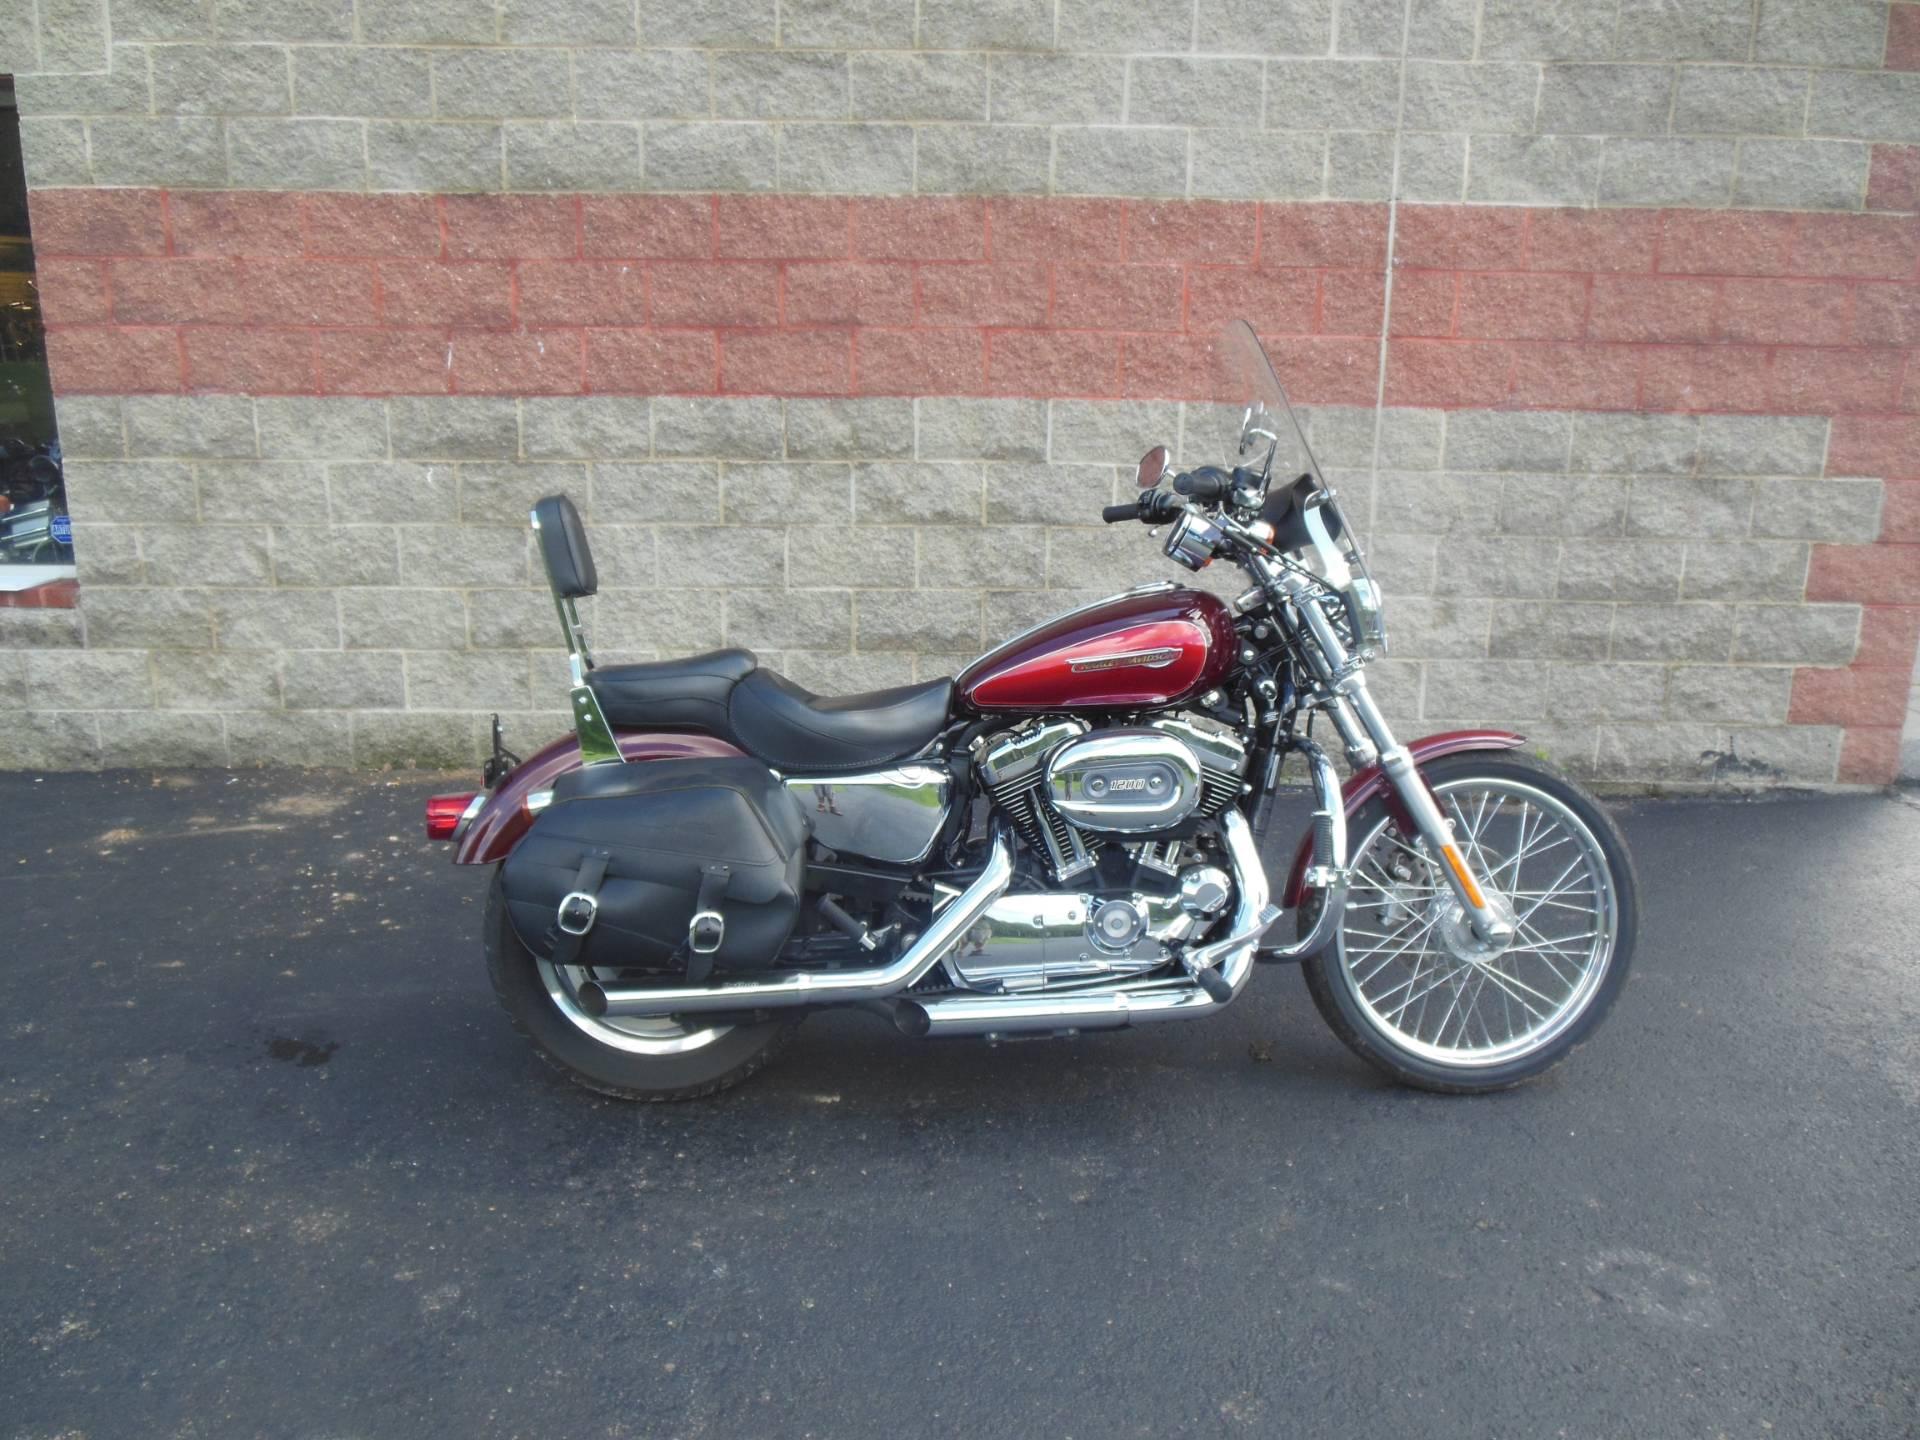 Used 2008 Harley-Davidson Sportster® 1200 Custom Motorcycles in ...